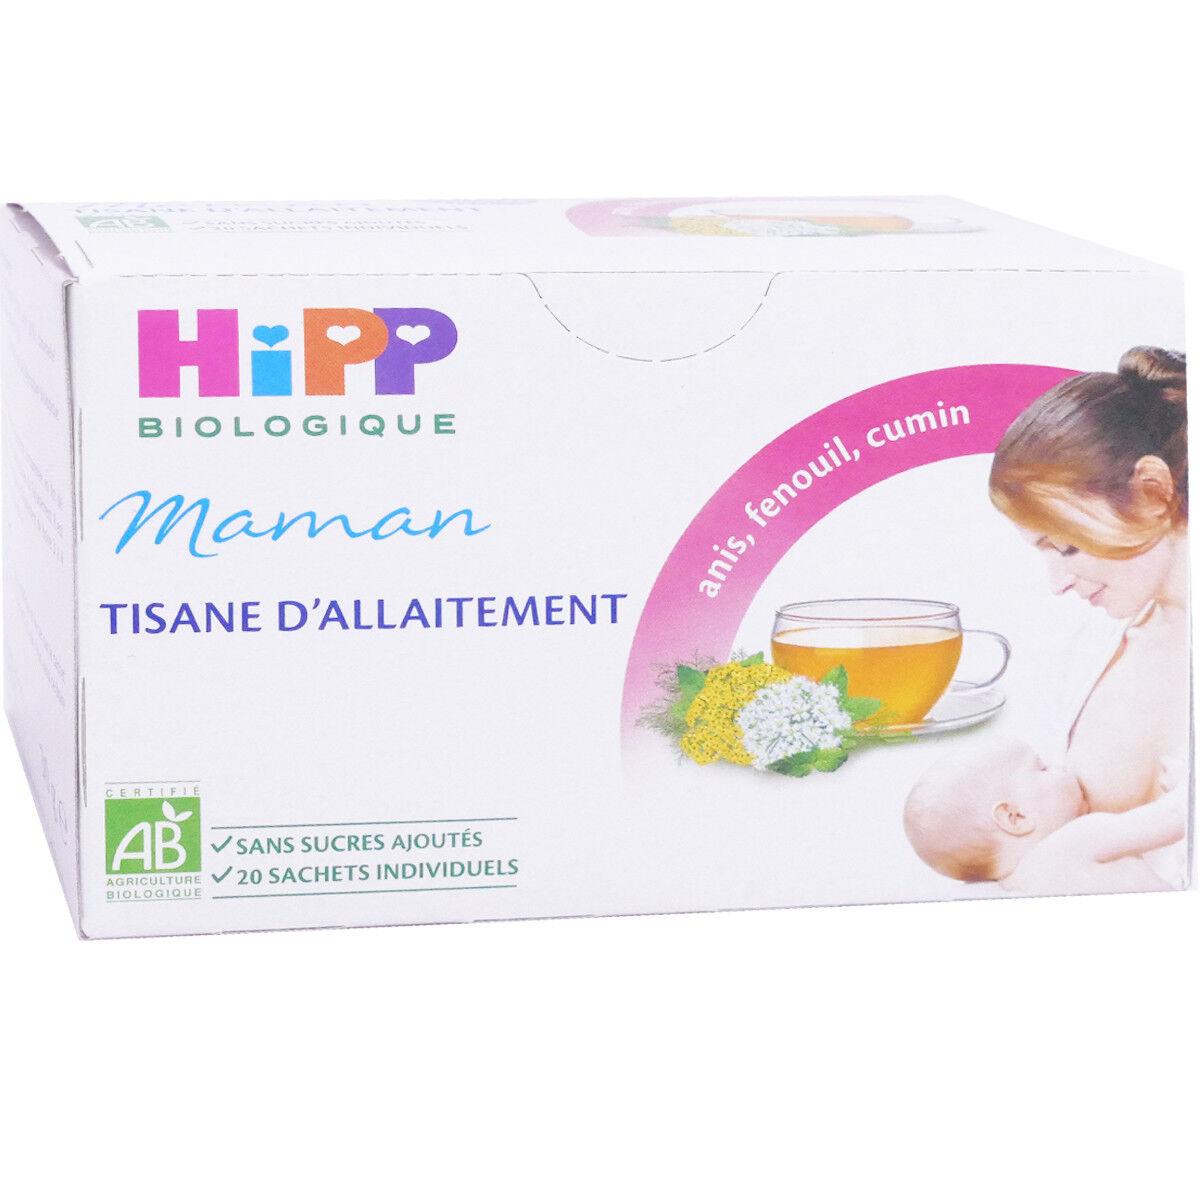 Hipp maman tisane d'allaitement 20 sachets